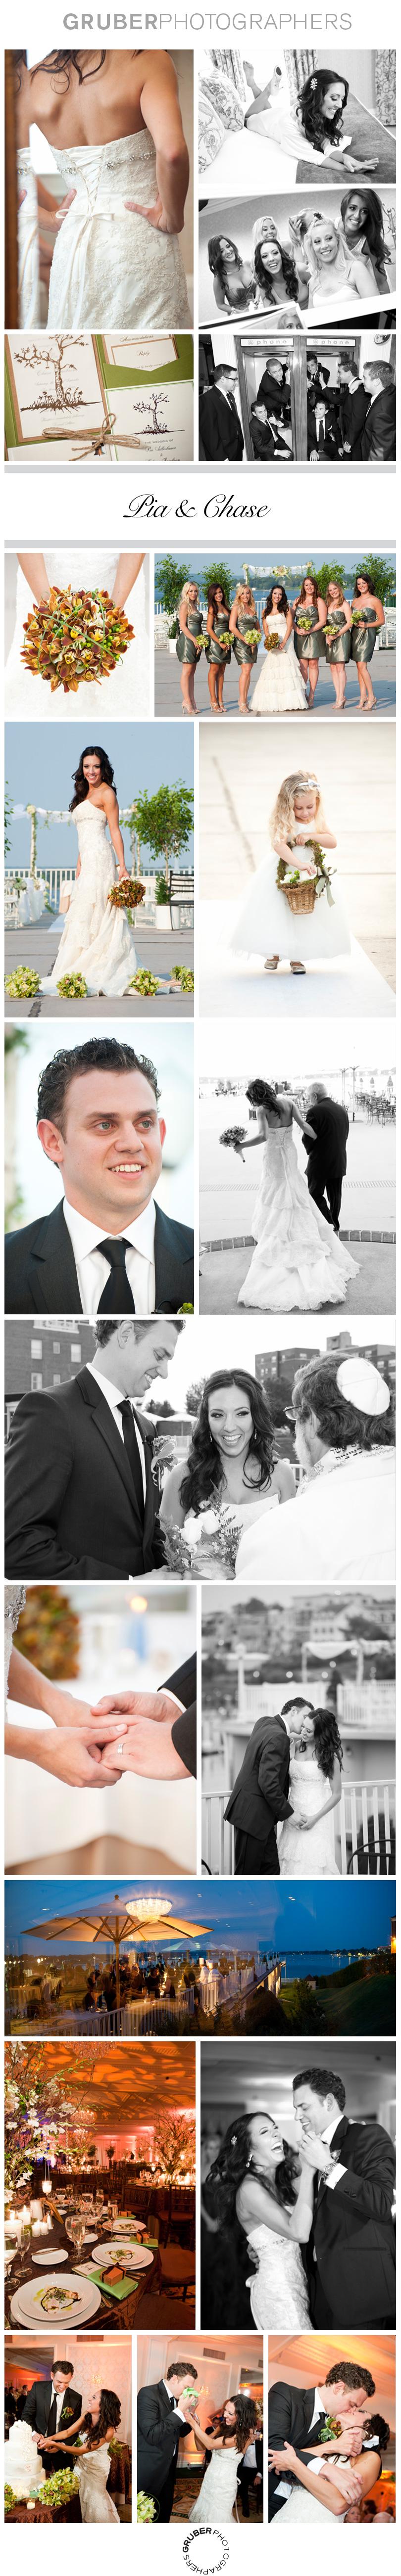 Wedding Photographer in NYC